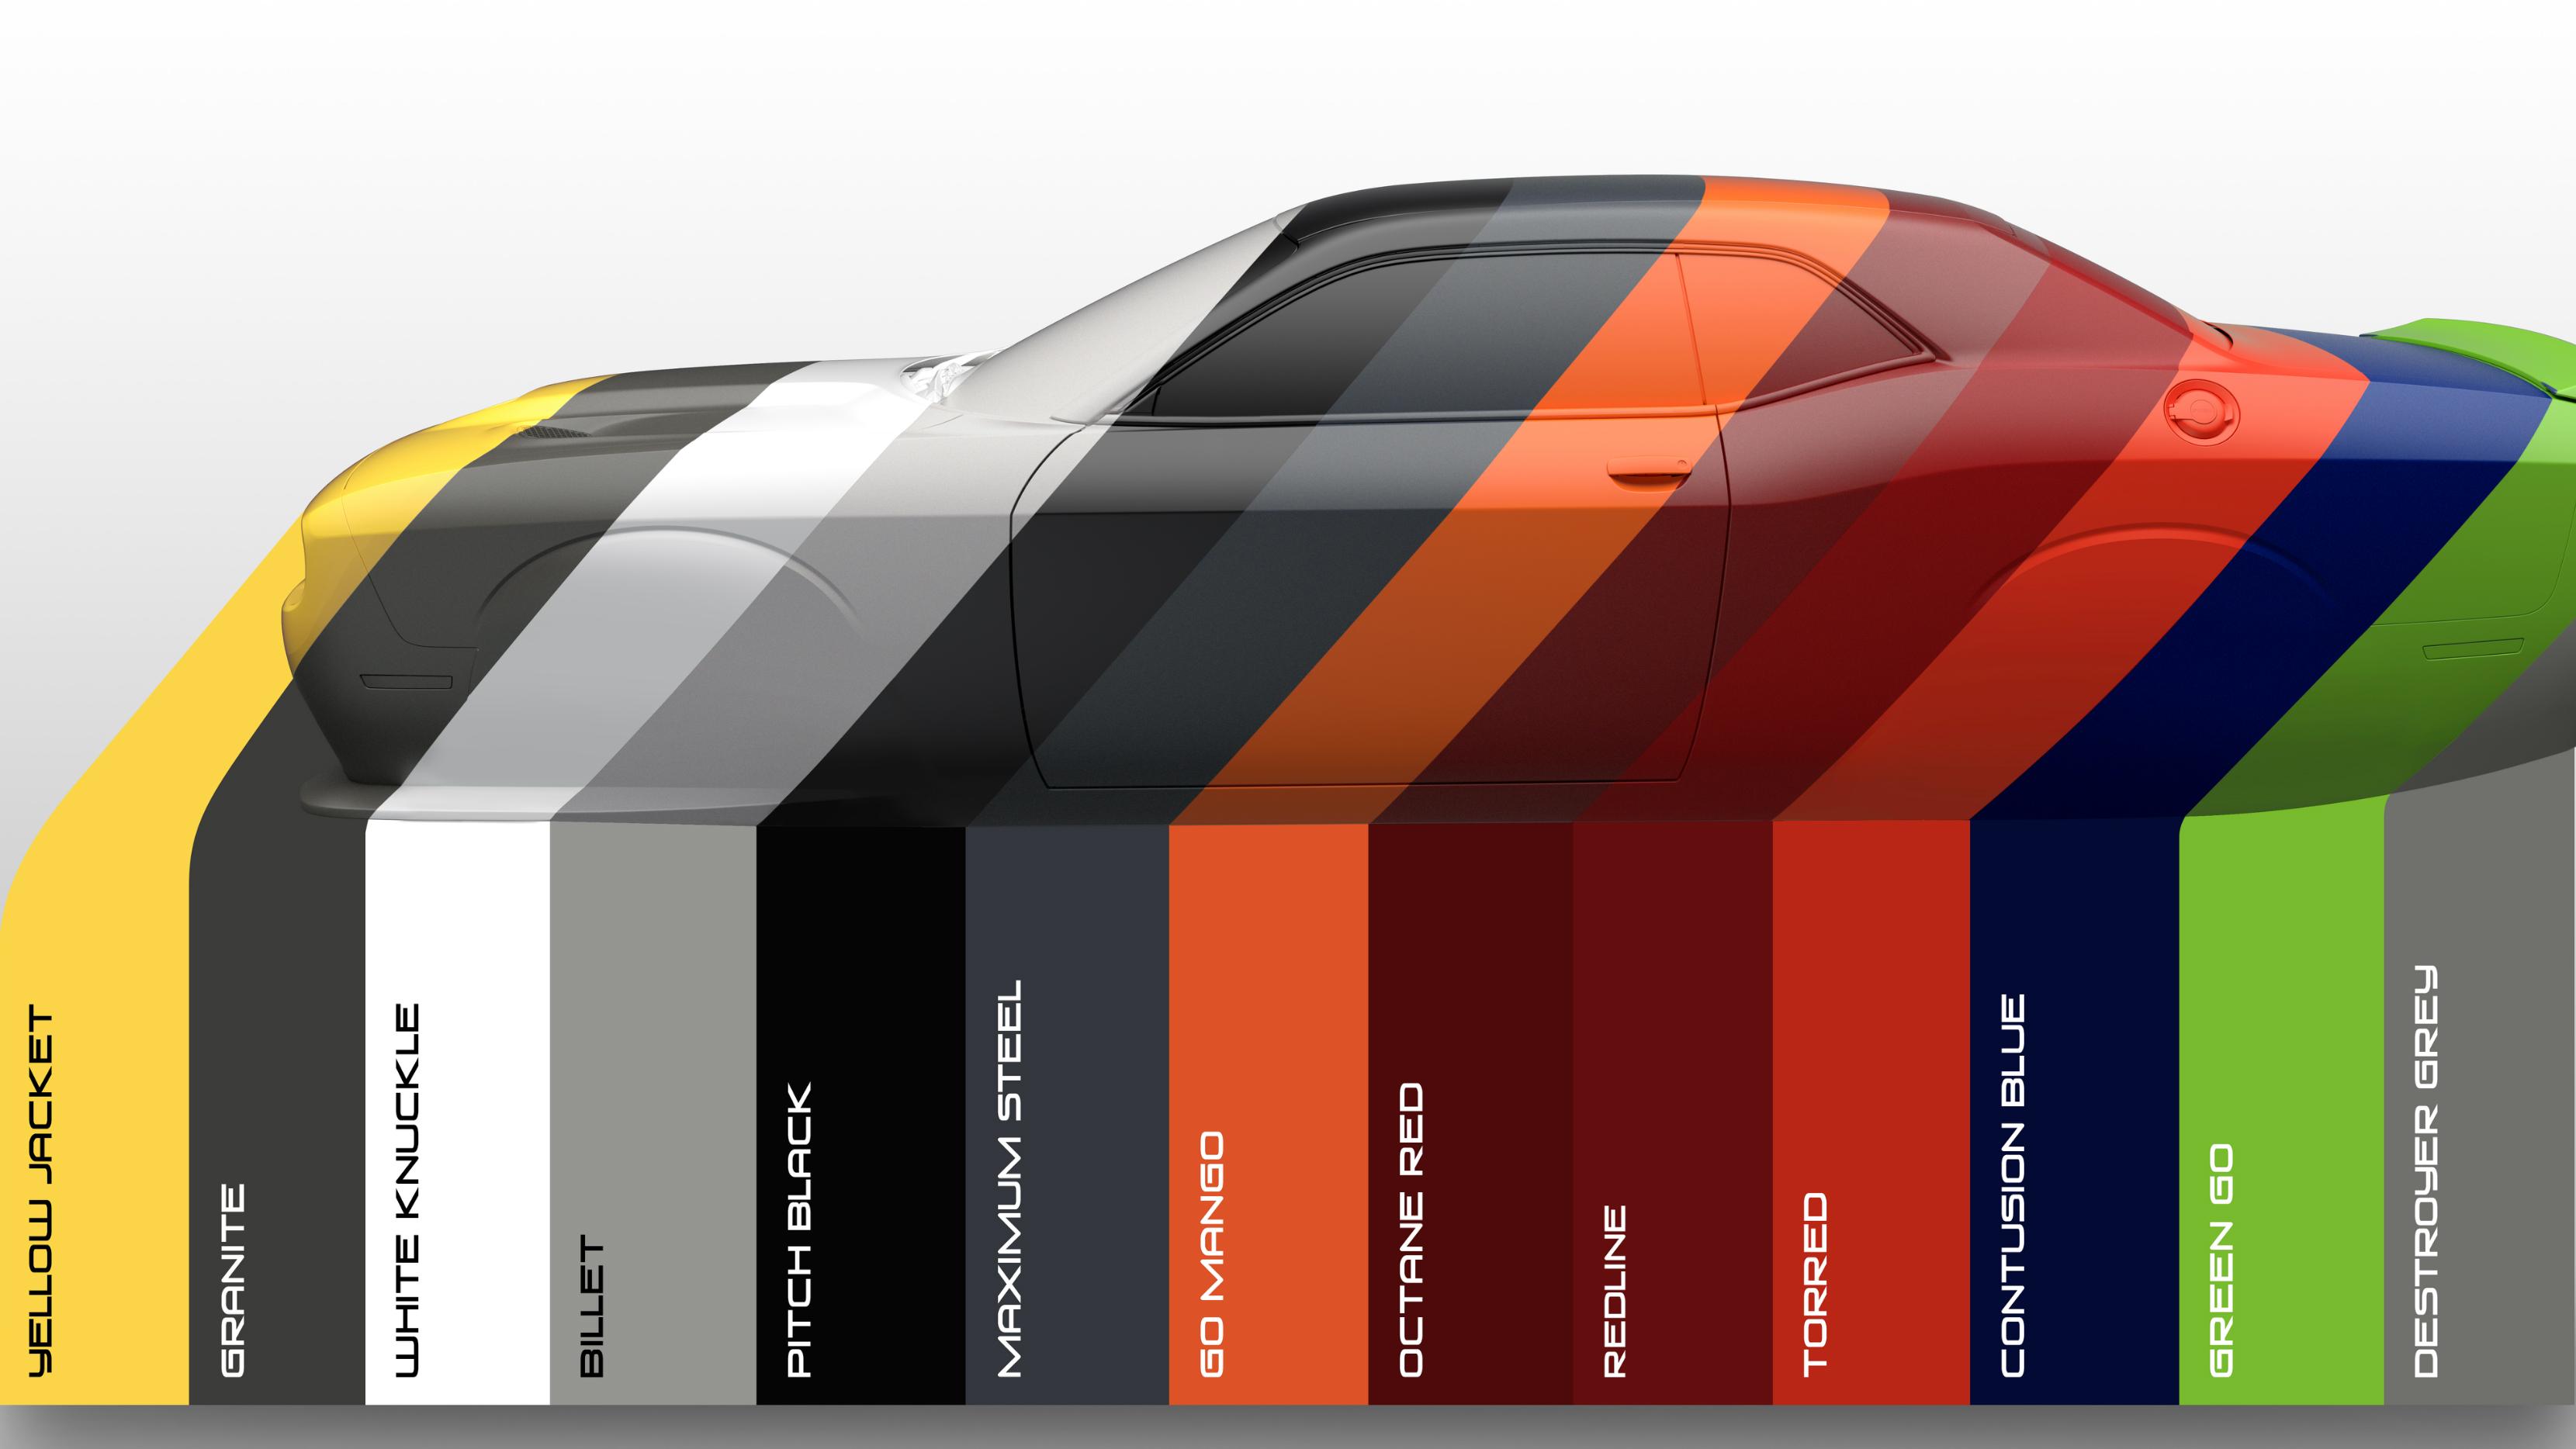 2017_Dodge_Challenger_colors